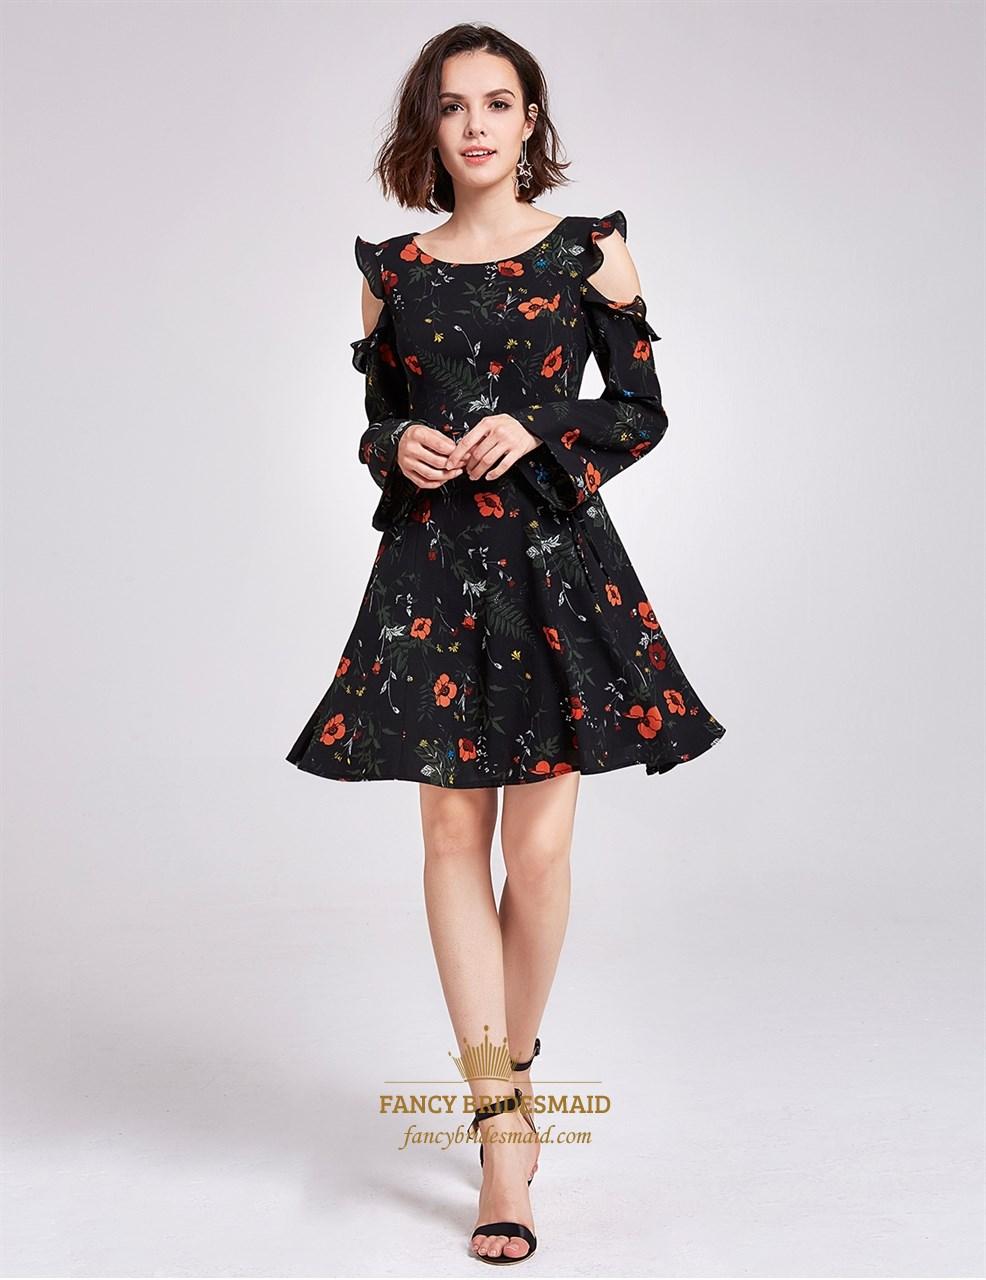 012cd50cbe Vintage Knee Length Black A-Line Floral Print Dress With Long Sleeves SKU  -FS2950